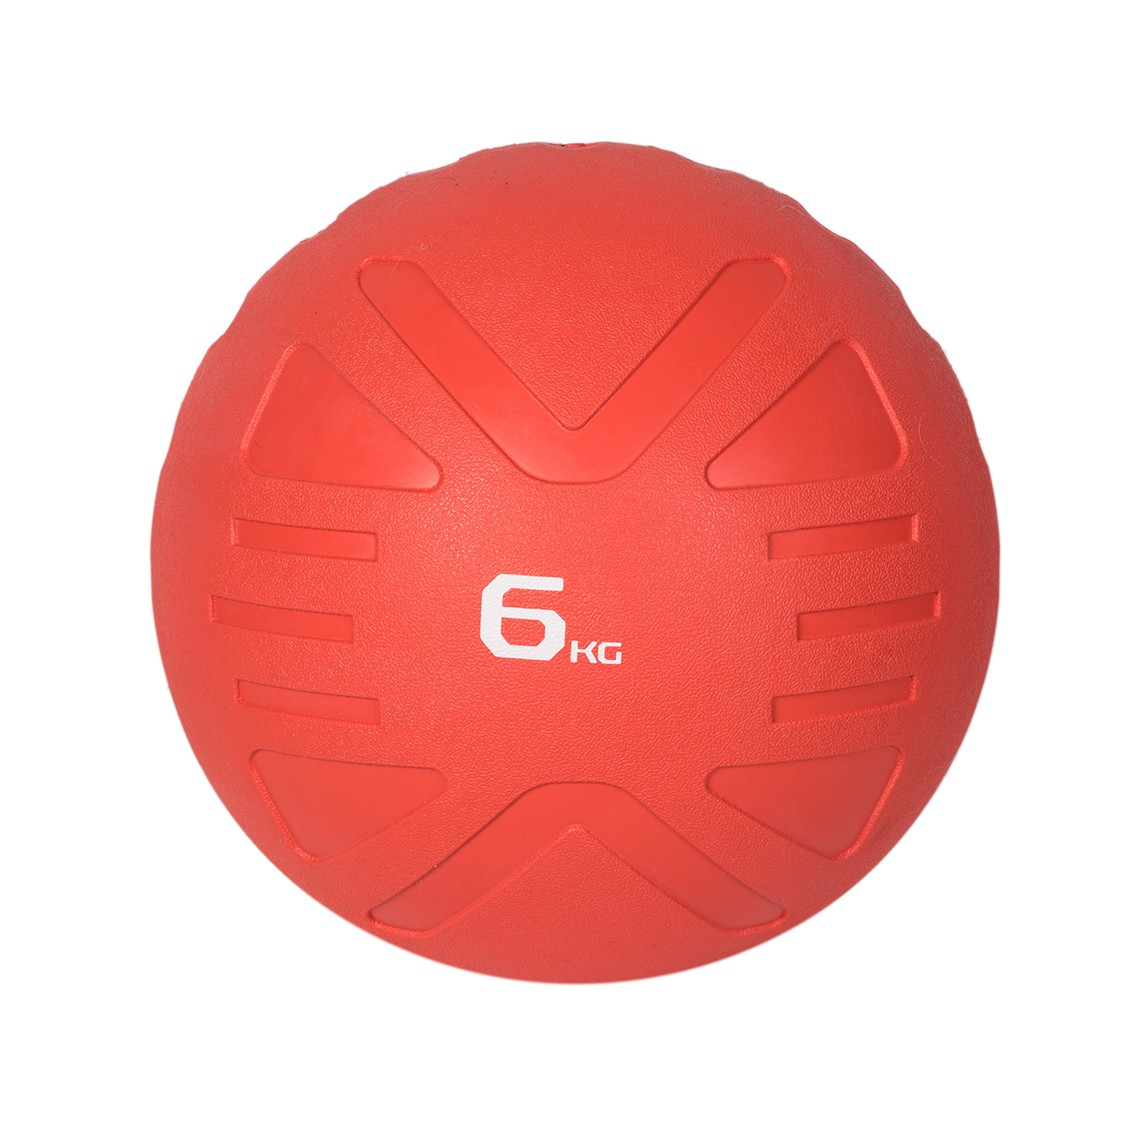 RUBBER MEDICINE BALL PROUD : Waga - 6kg